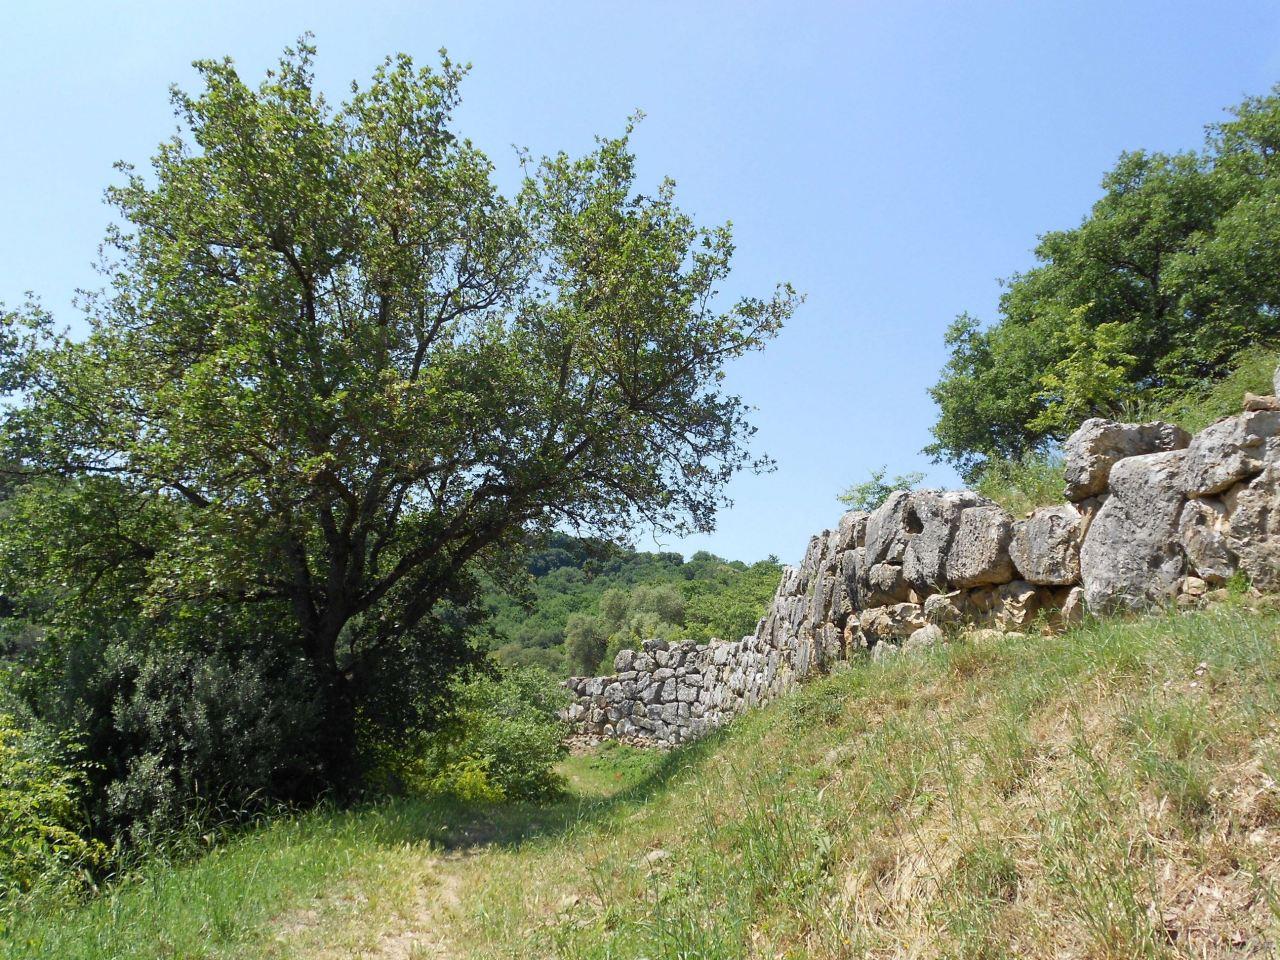 Roselle-Mura-Megalitiche-Roselle-Grosseto-Toscana-Italia-1